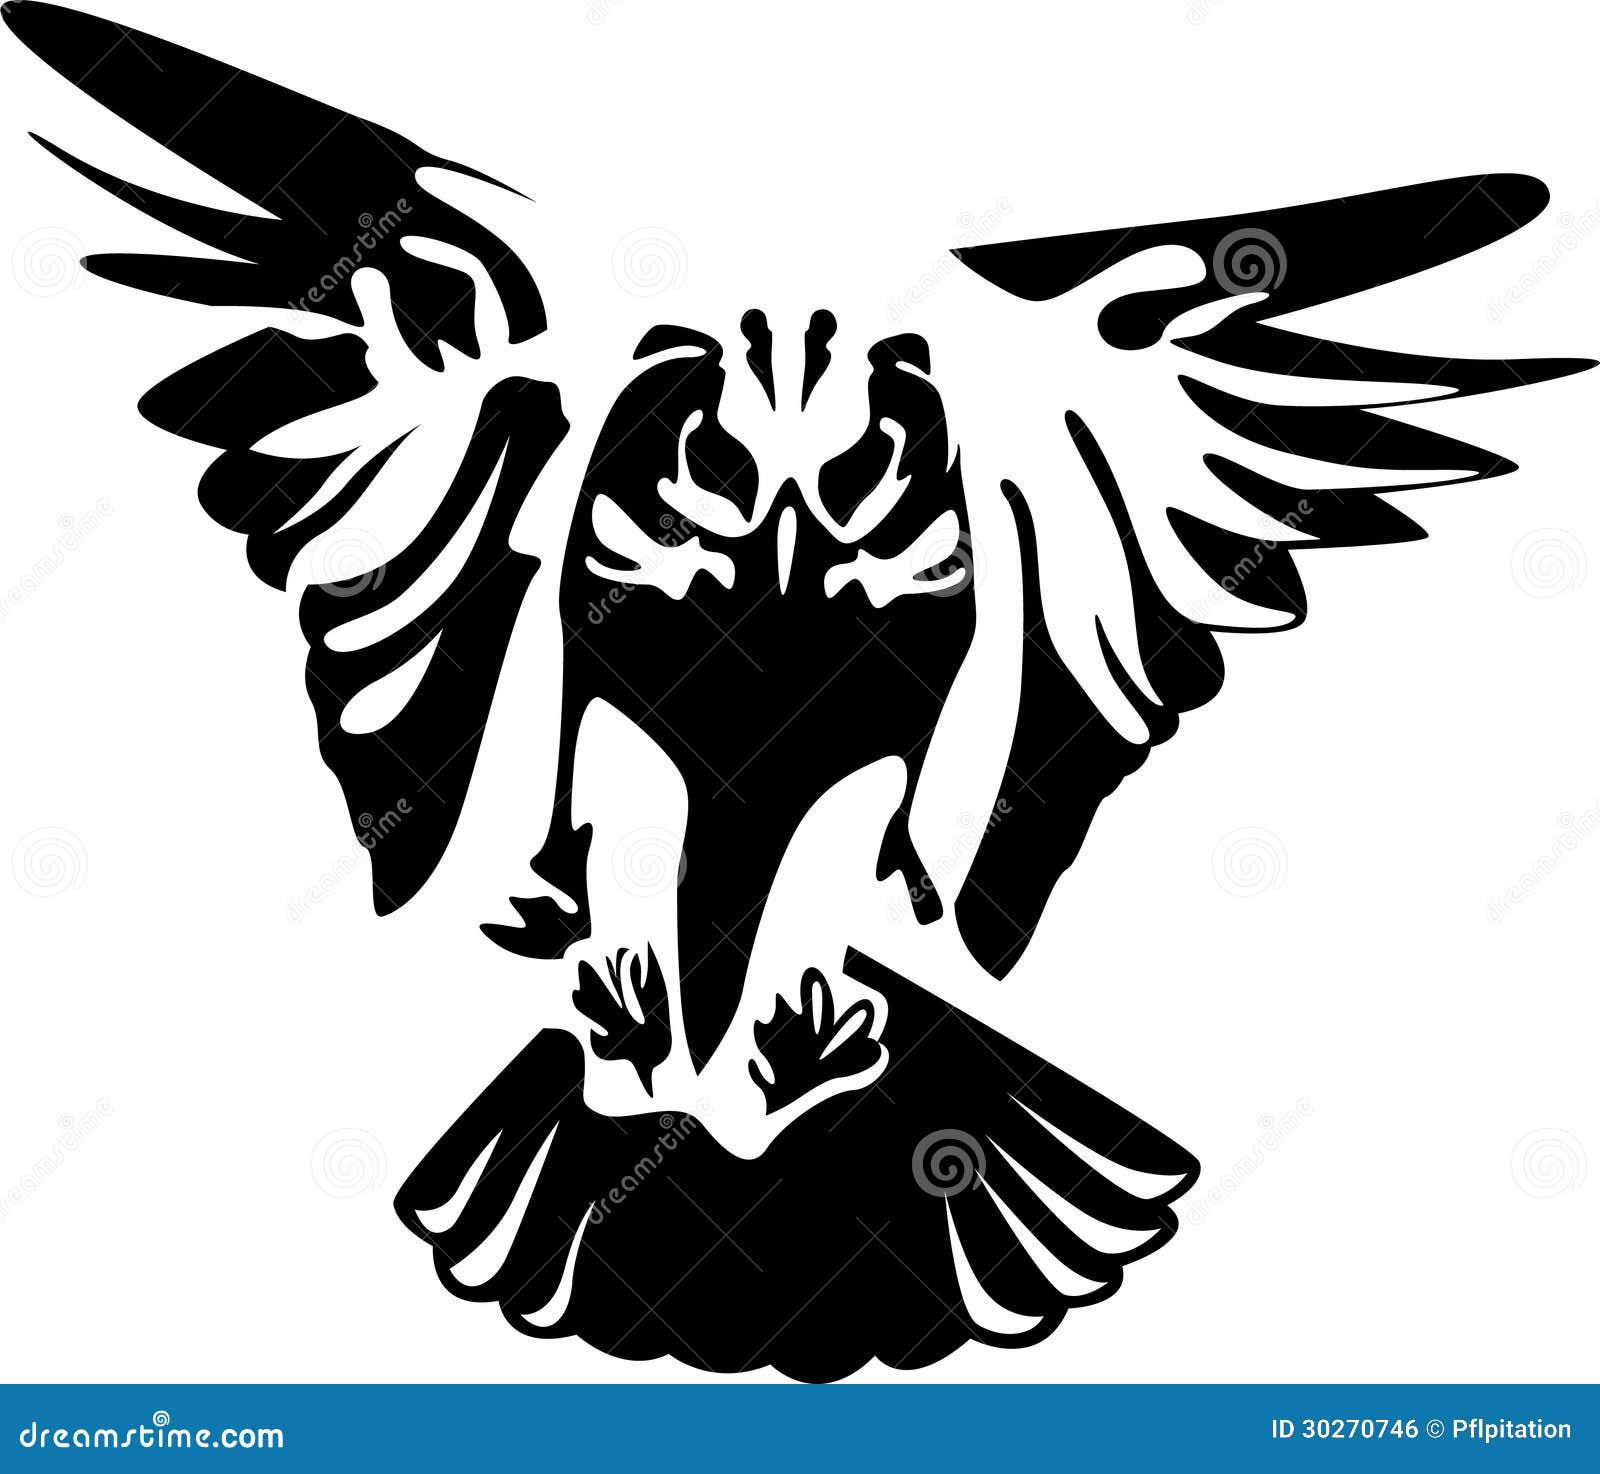 Flying owl stencil - photo#19